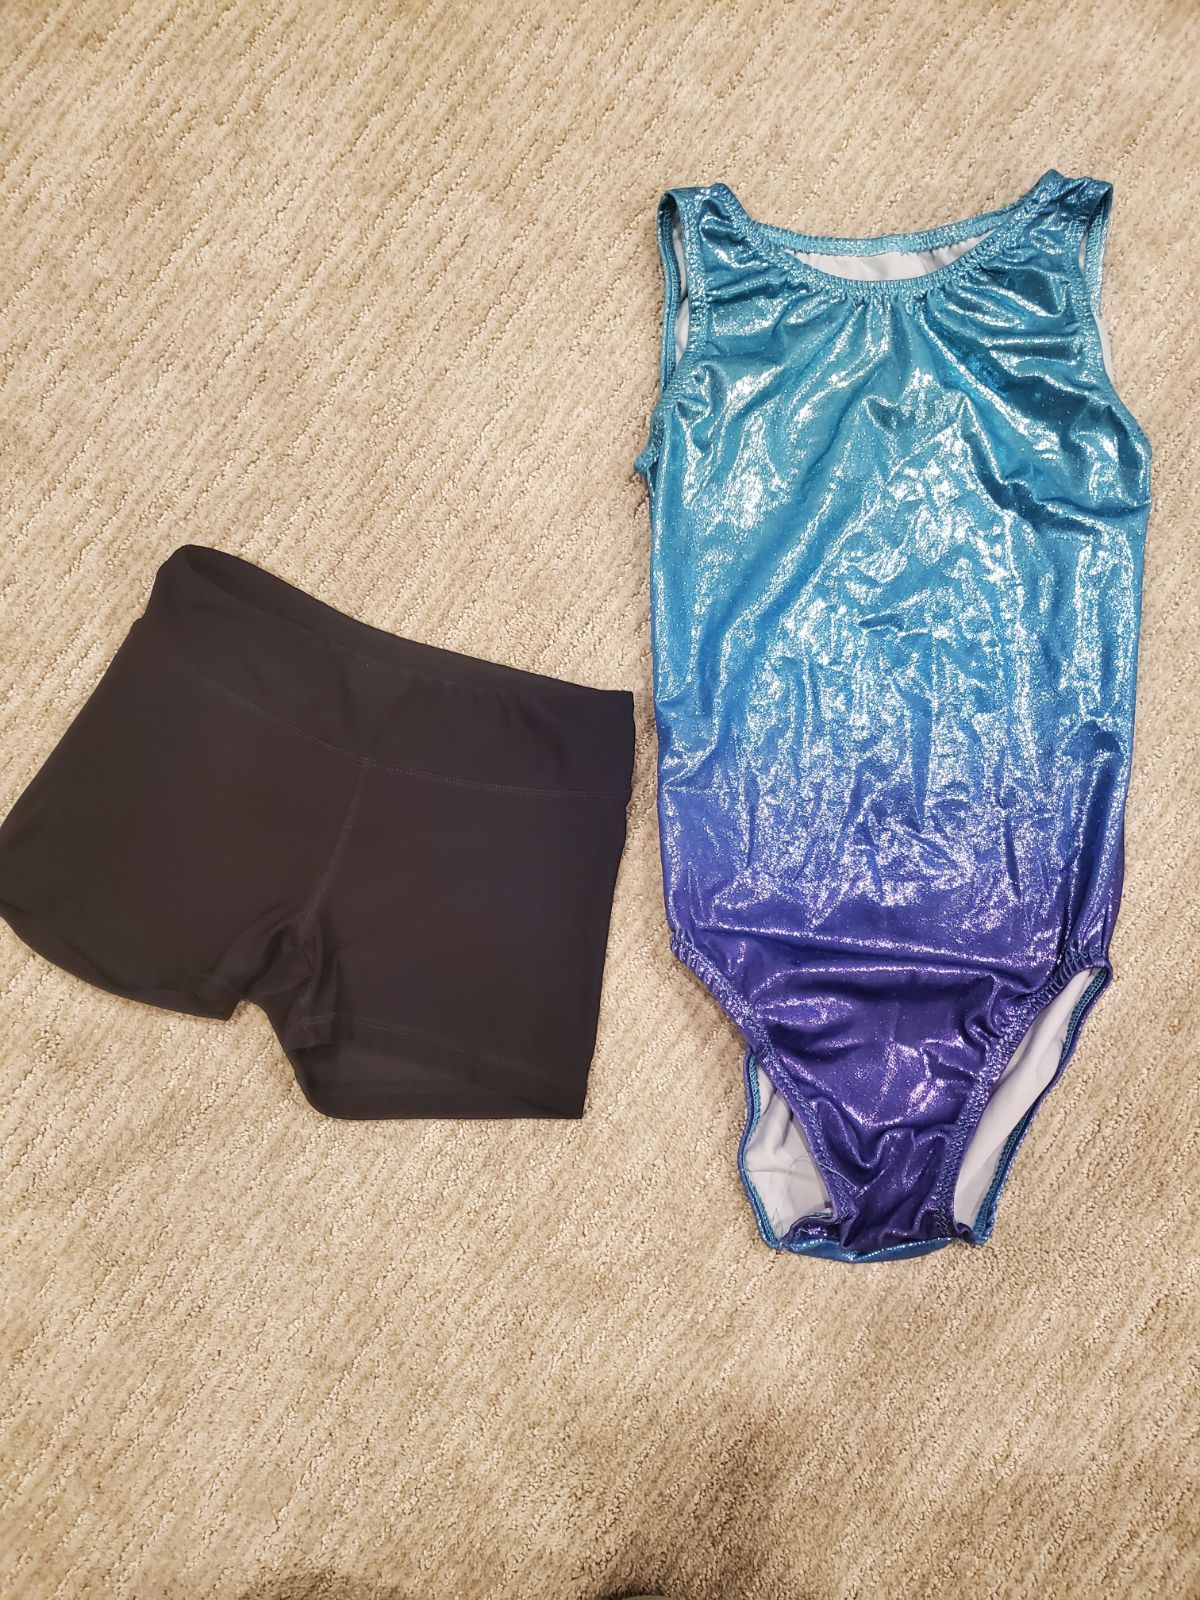 Girls gymnastics leotard and shorts